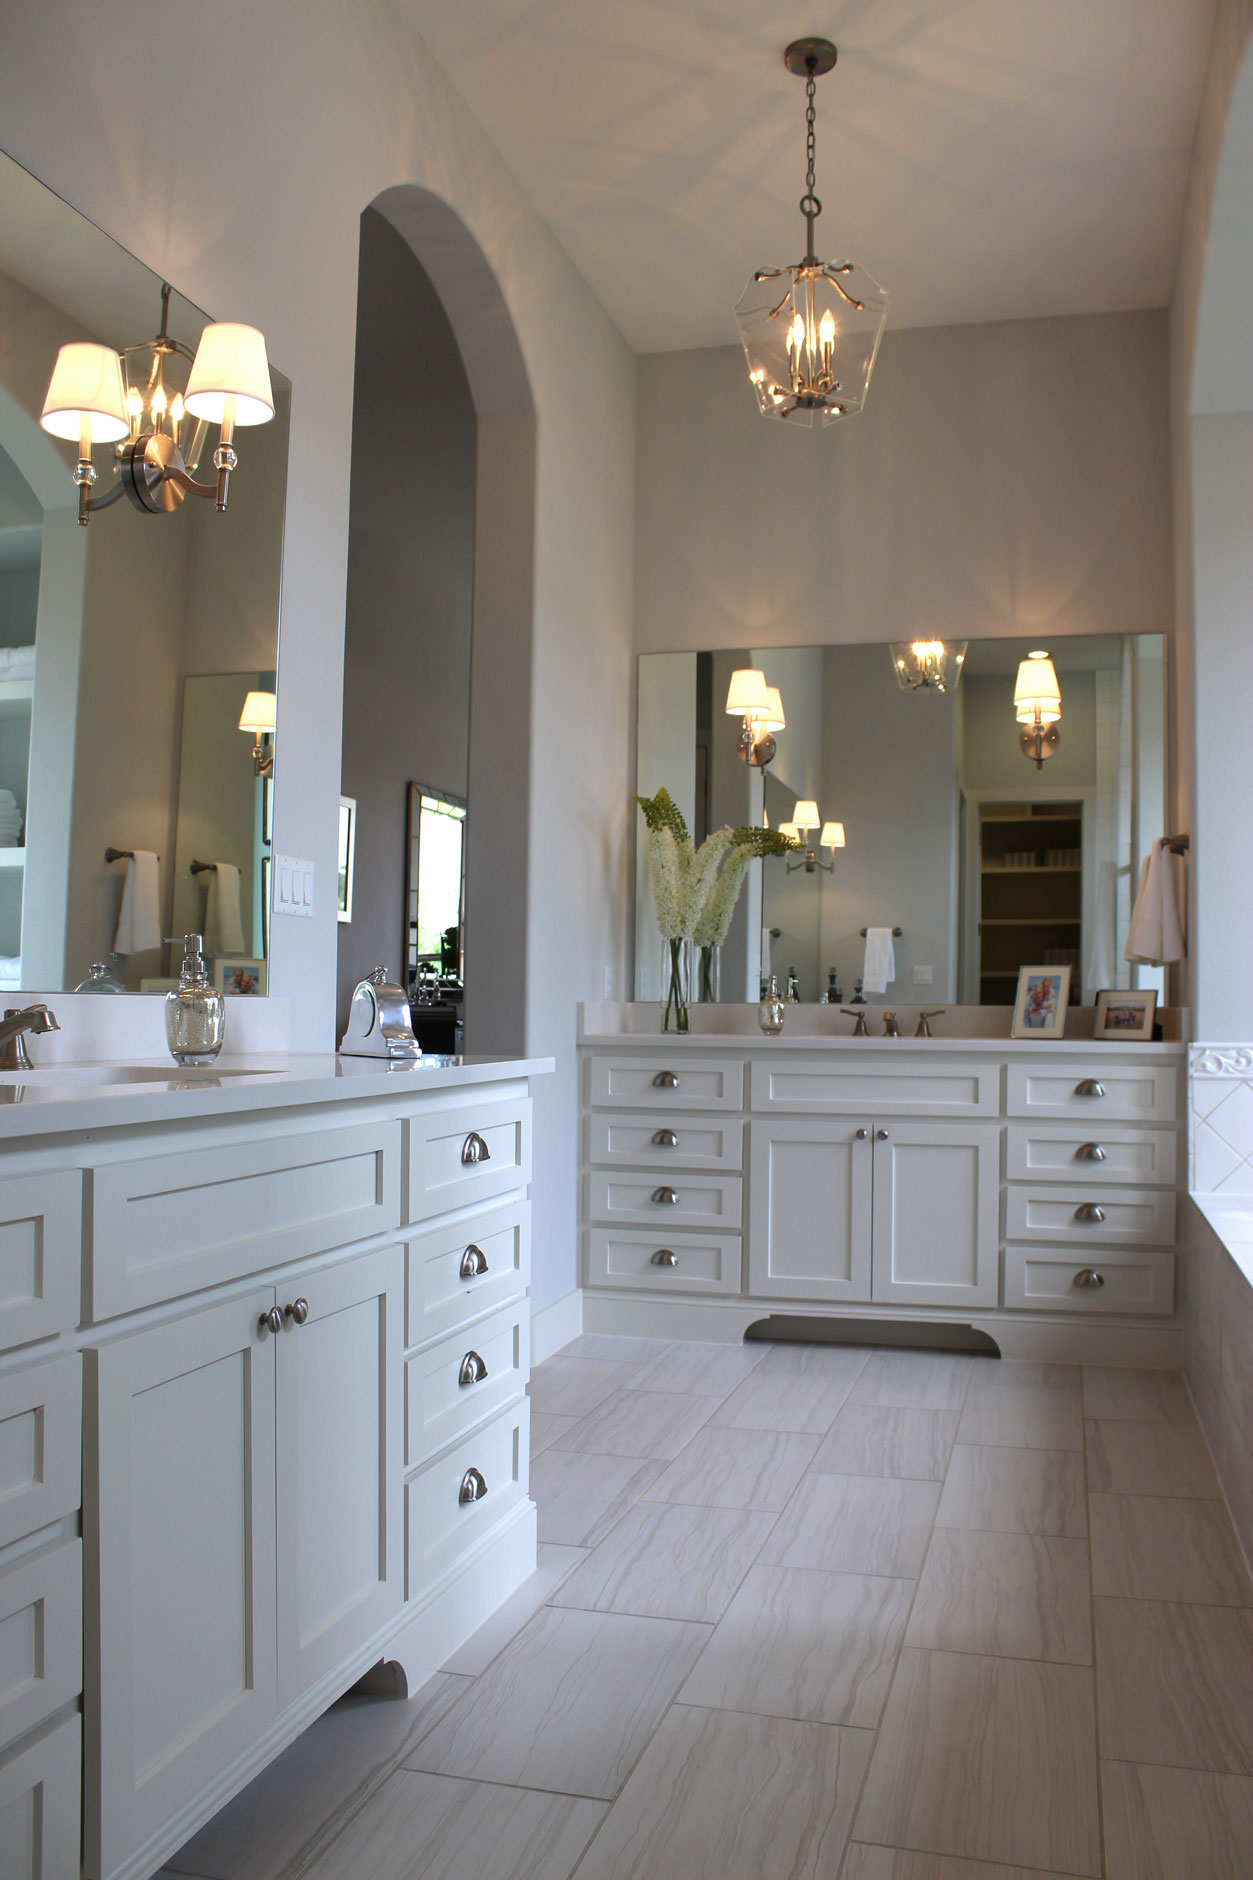 Burrows Cabinets white master bath cabinets 1